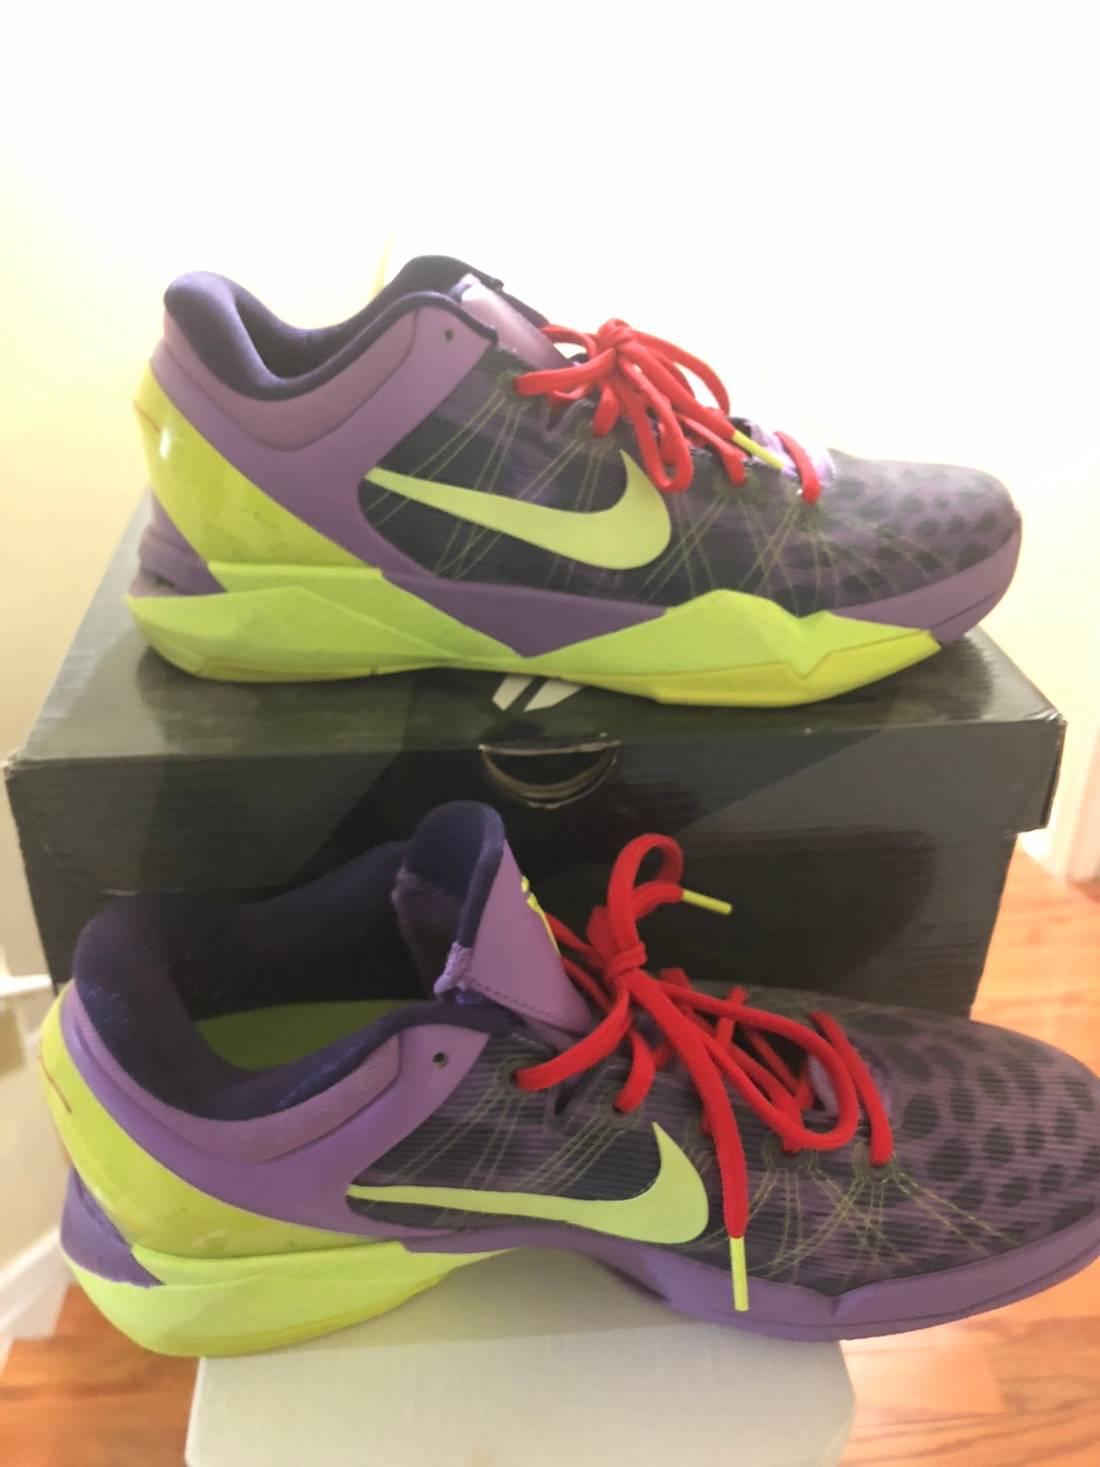 Nike Kobe 7 Christmas Size 11.5 - Hi-Top Sneakers for Sale - Grailed